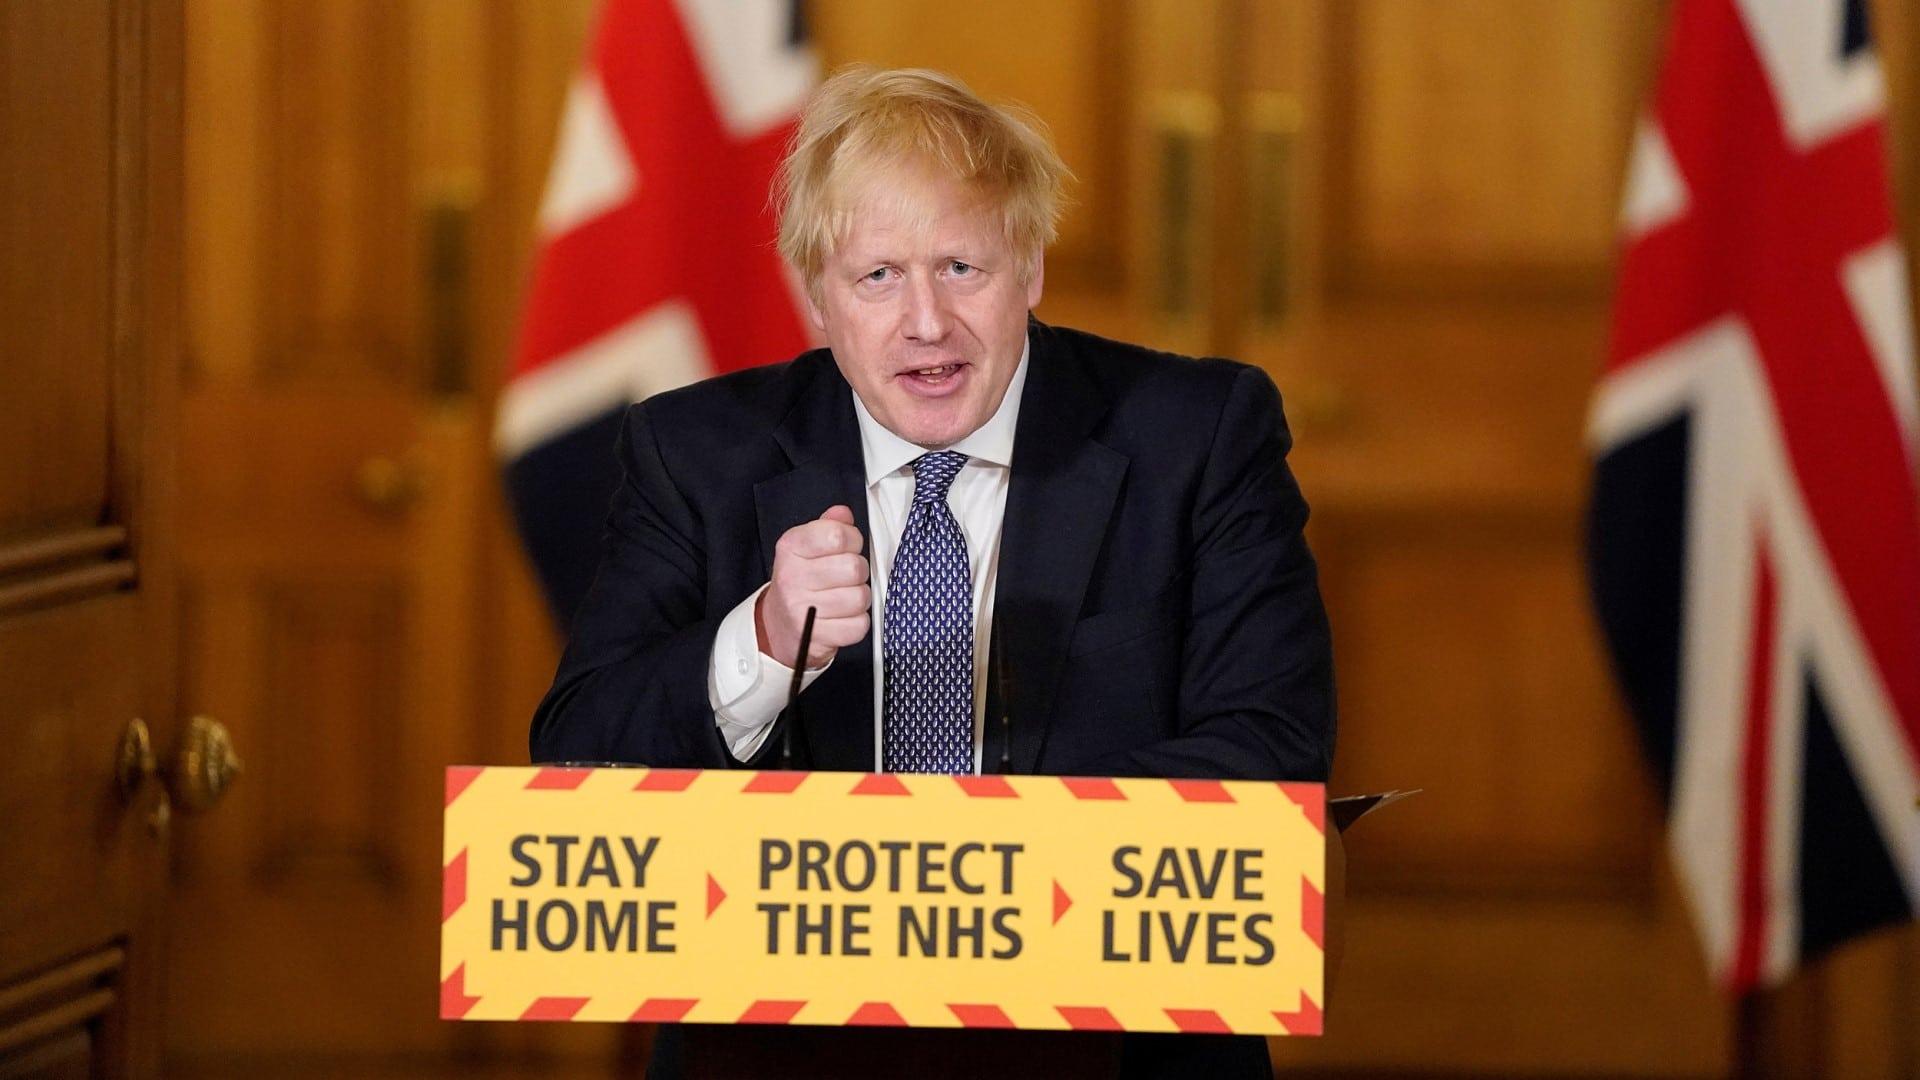 PM Boris Johnson holding a press conference at Downing Street